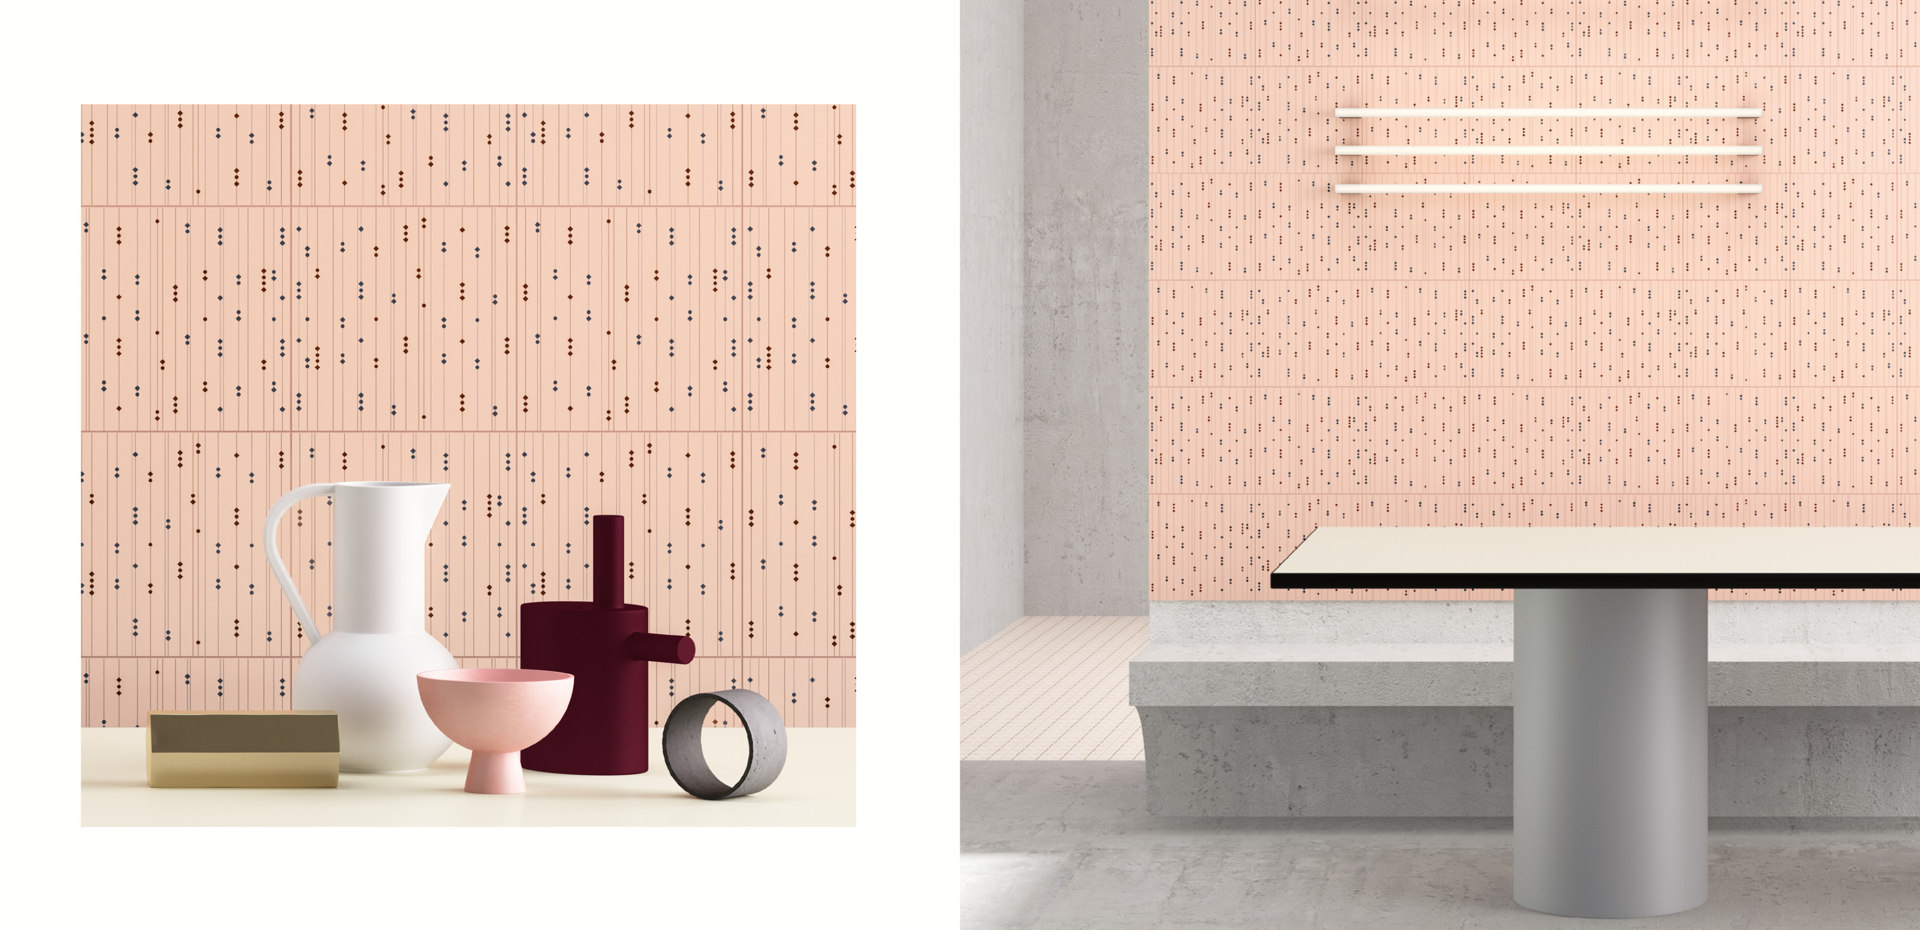 Listino Prezzi Ceramica Vogue.Ceramica Vogue Confetti